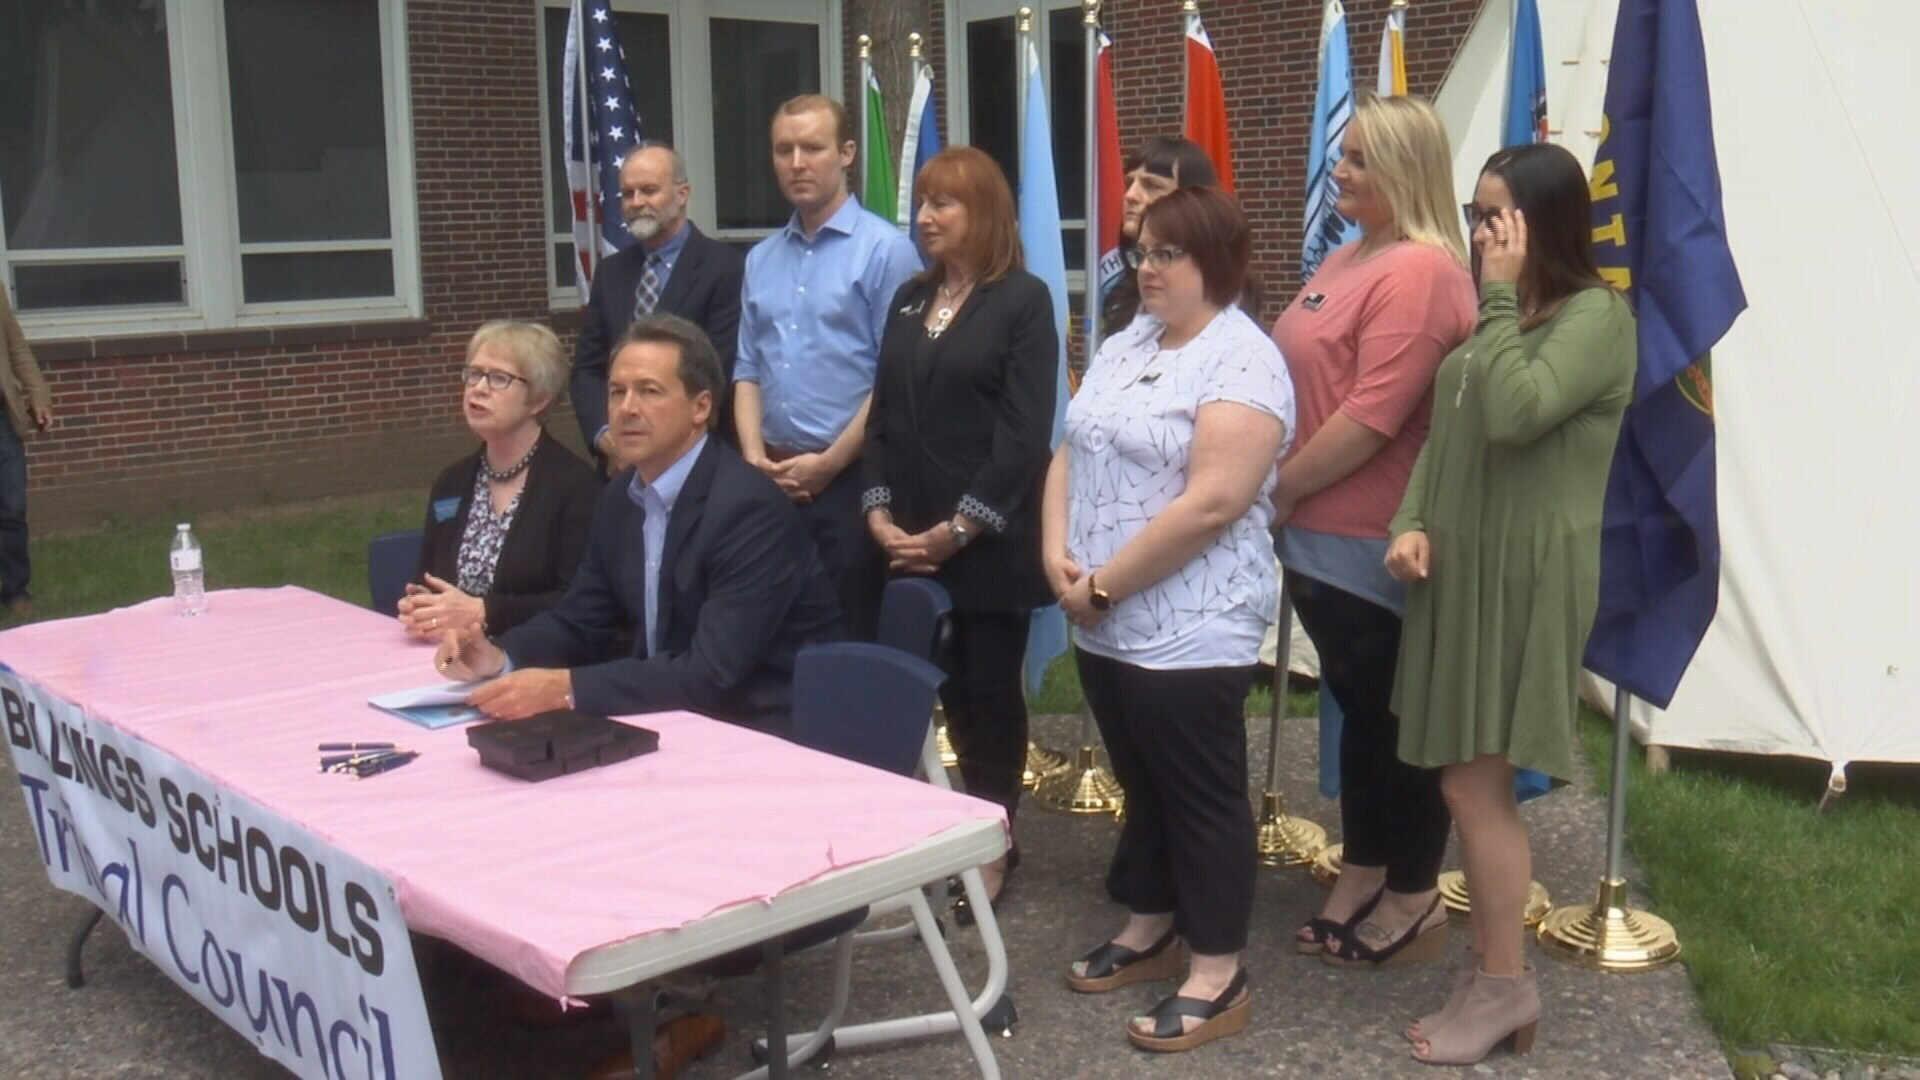 State Sen. MacDonald and Gov. Bullock seated at signing of SB 153. (MTN News photo)